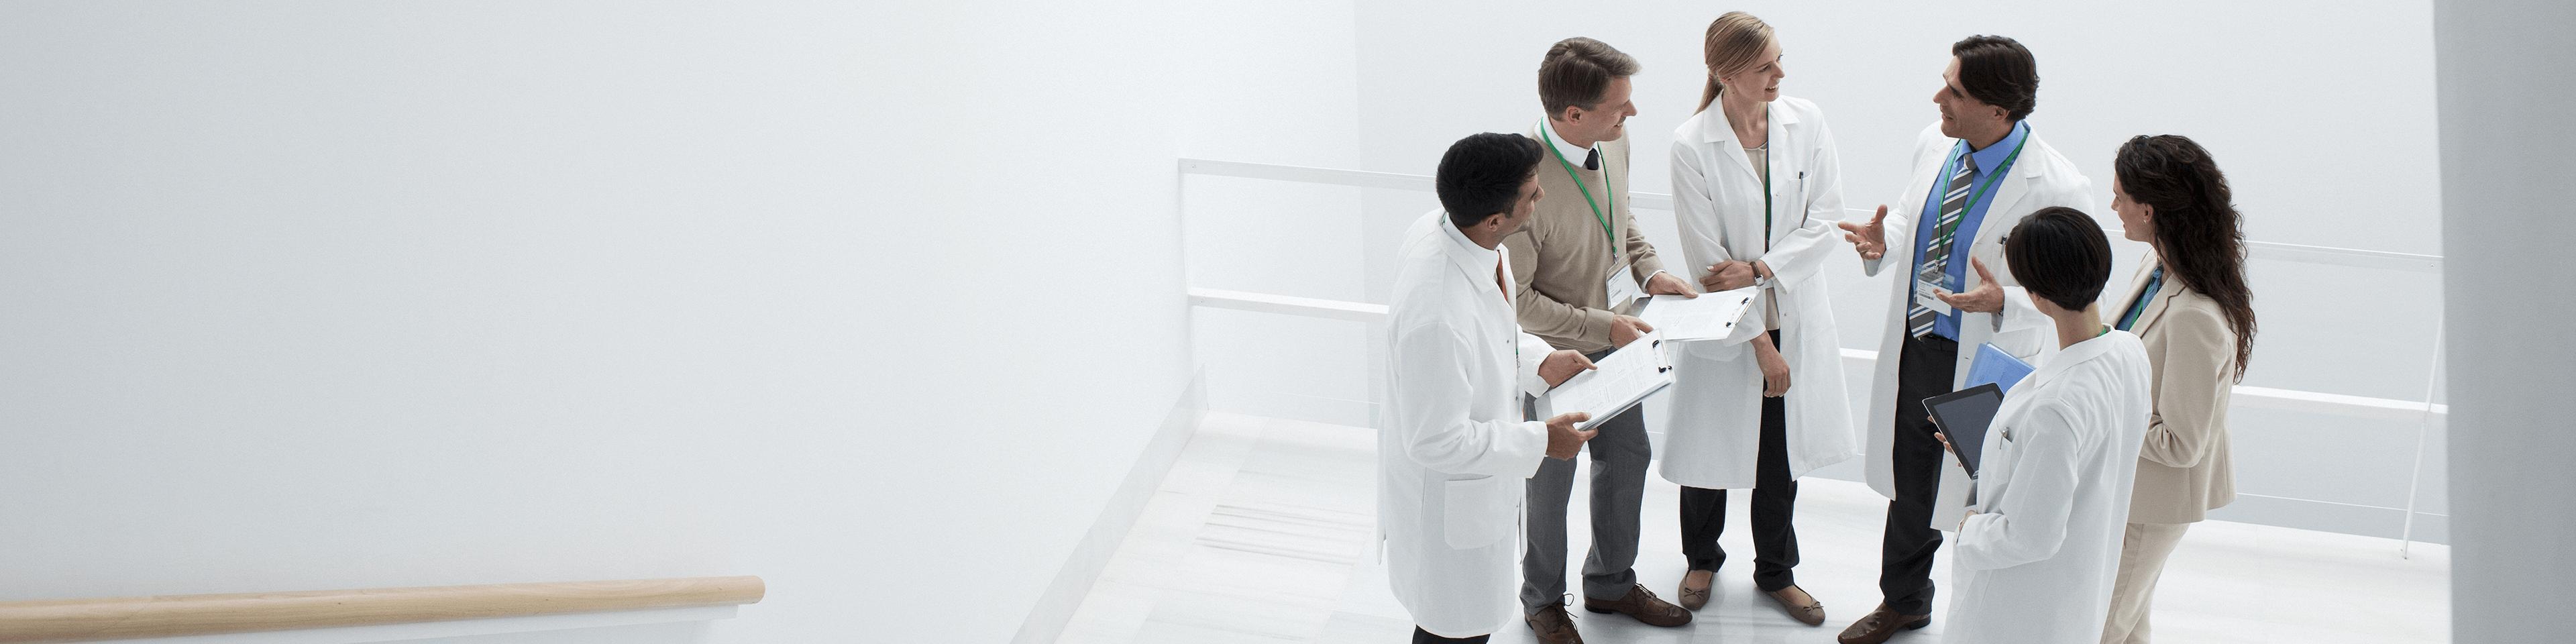 Clinicians-In-Hallway